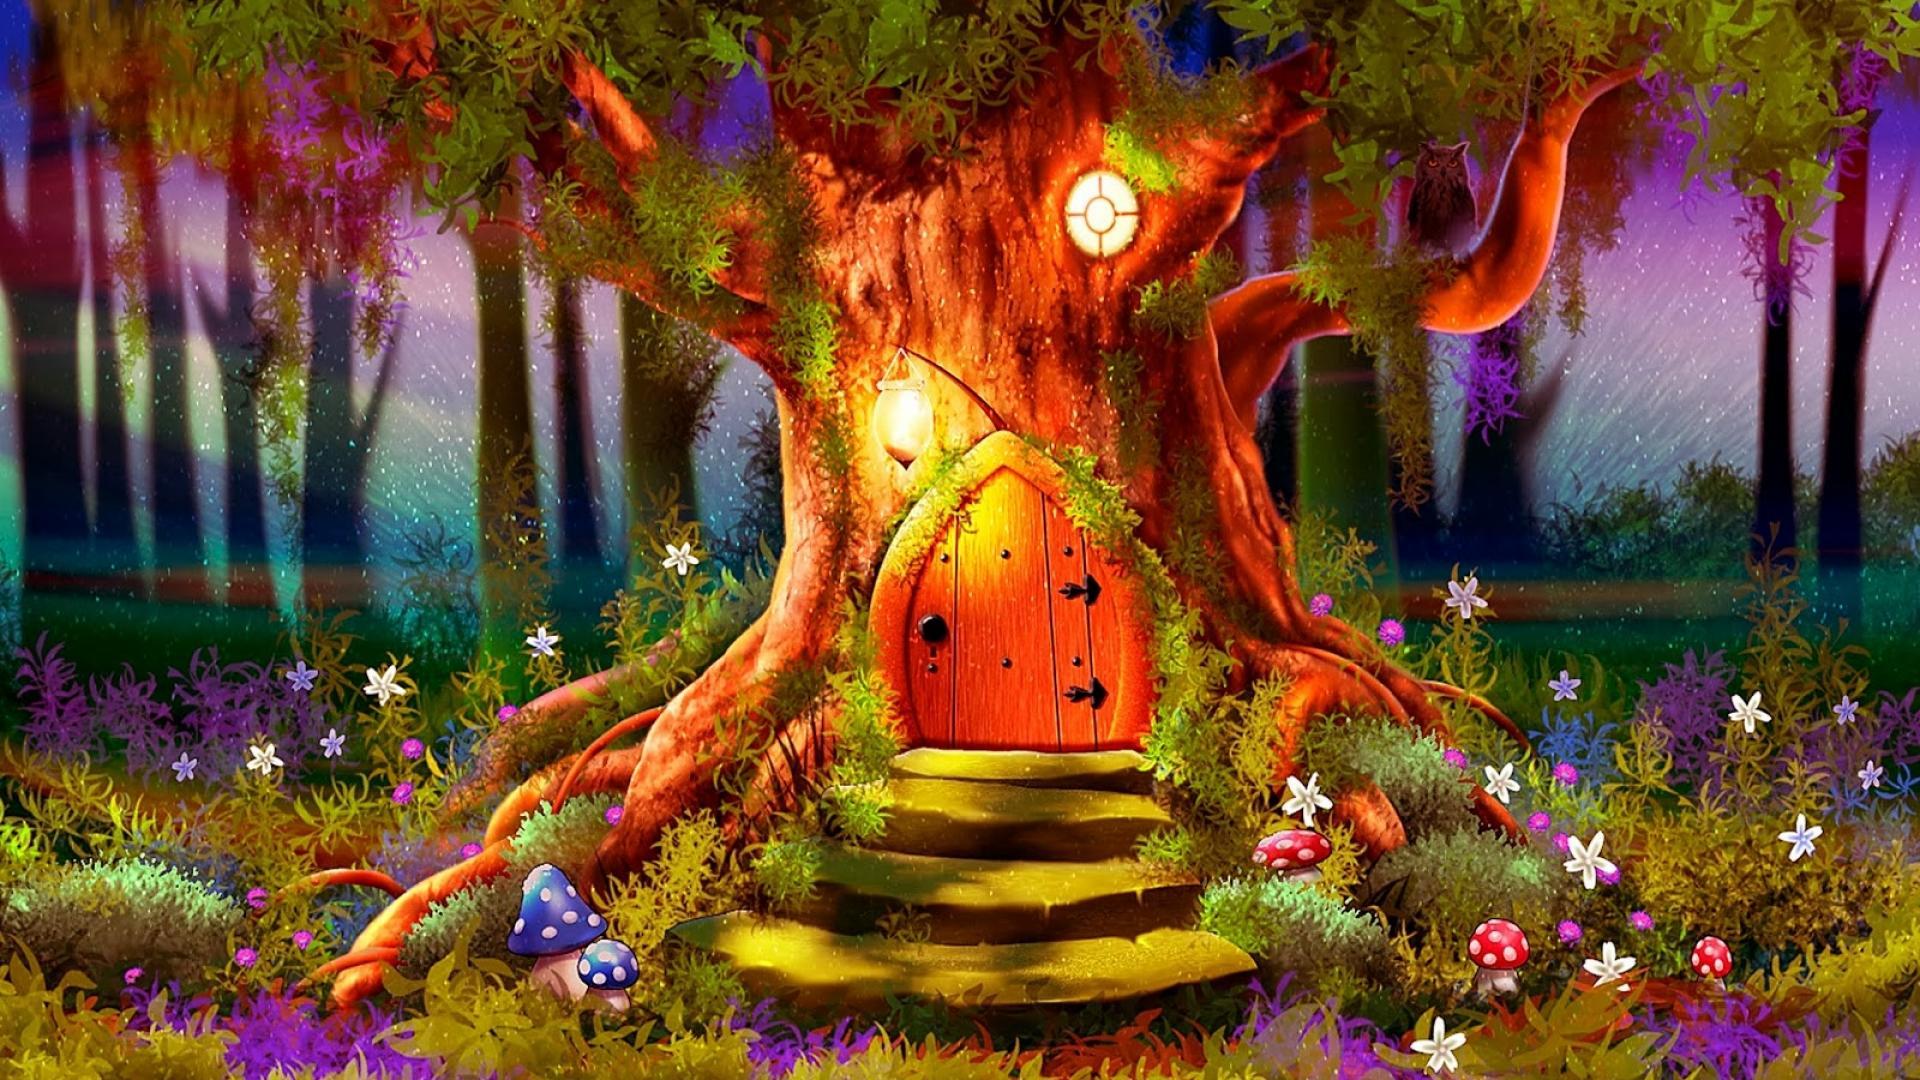 20 fantasy colorful tree - photo #27